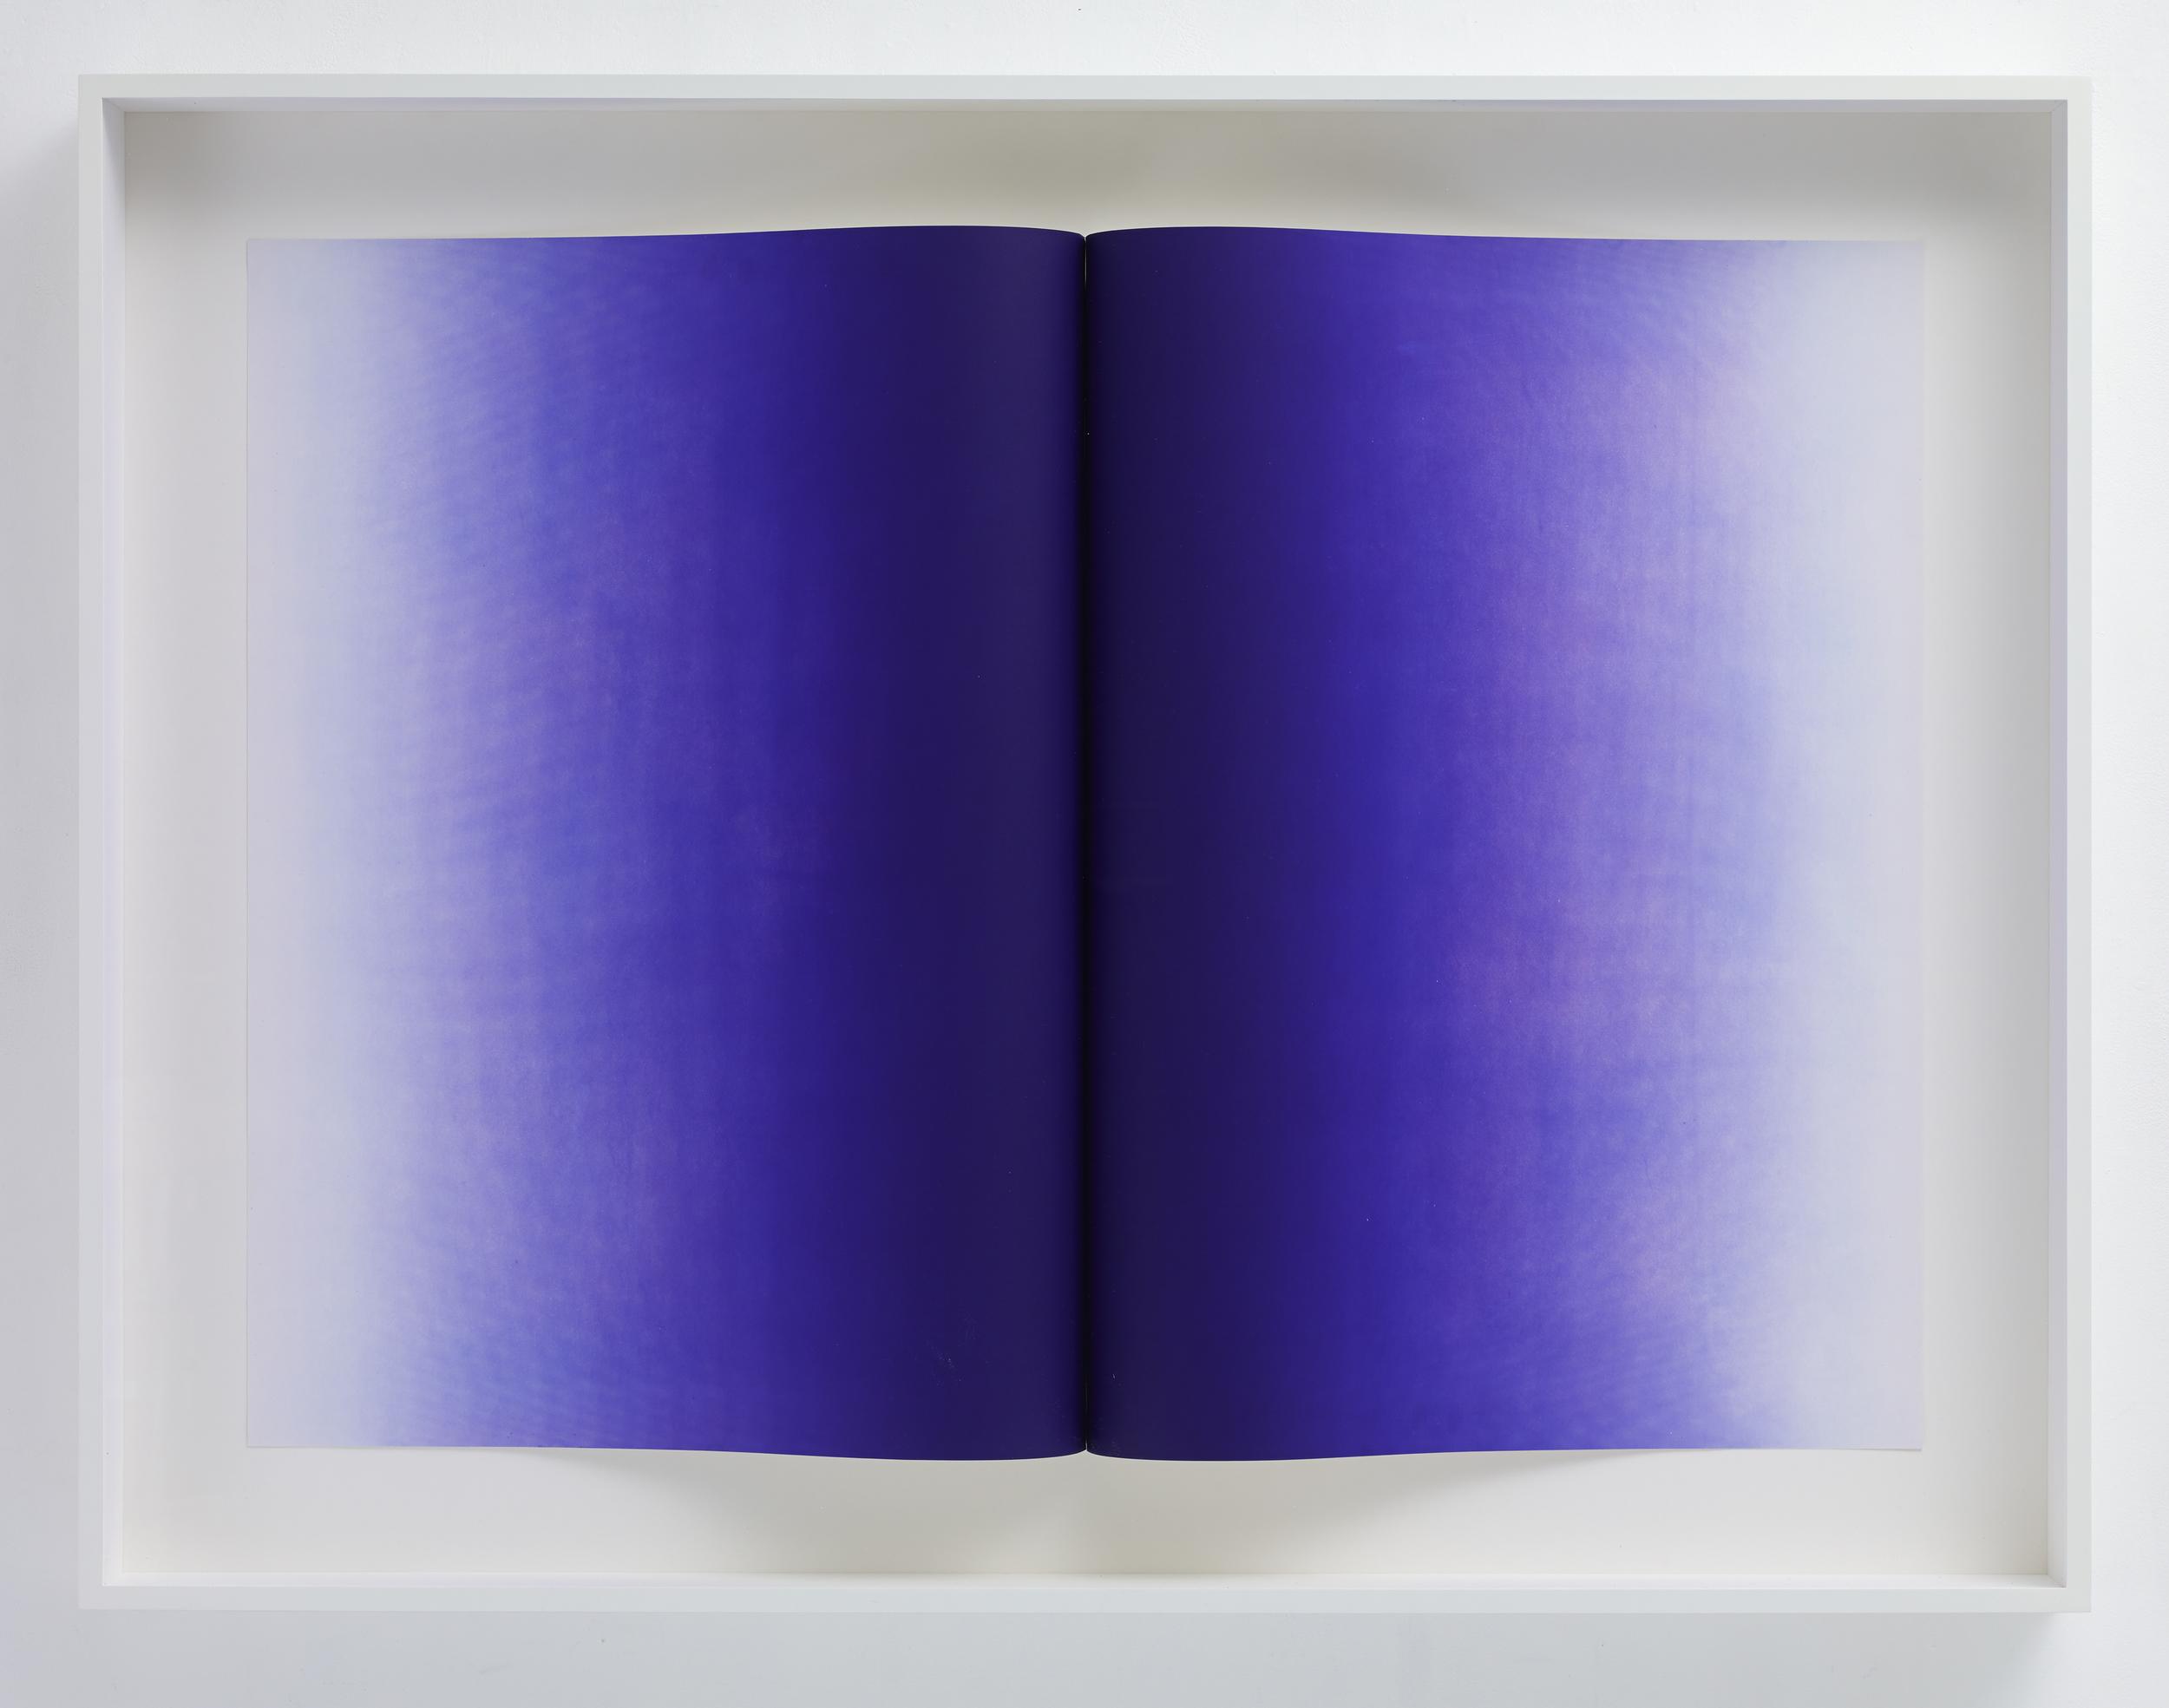 Fold III  2014  gravura em metal  157 cm x 119,8 cm